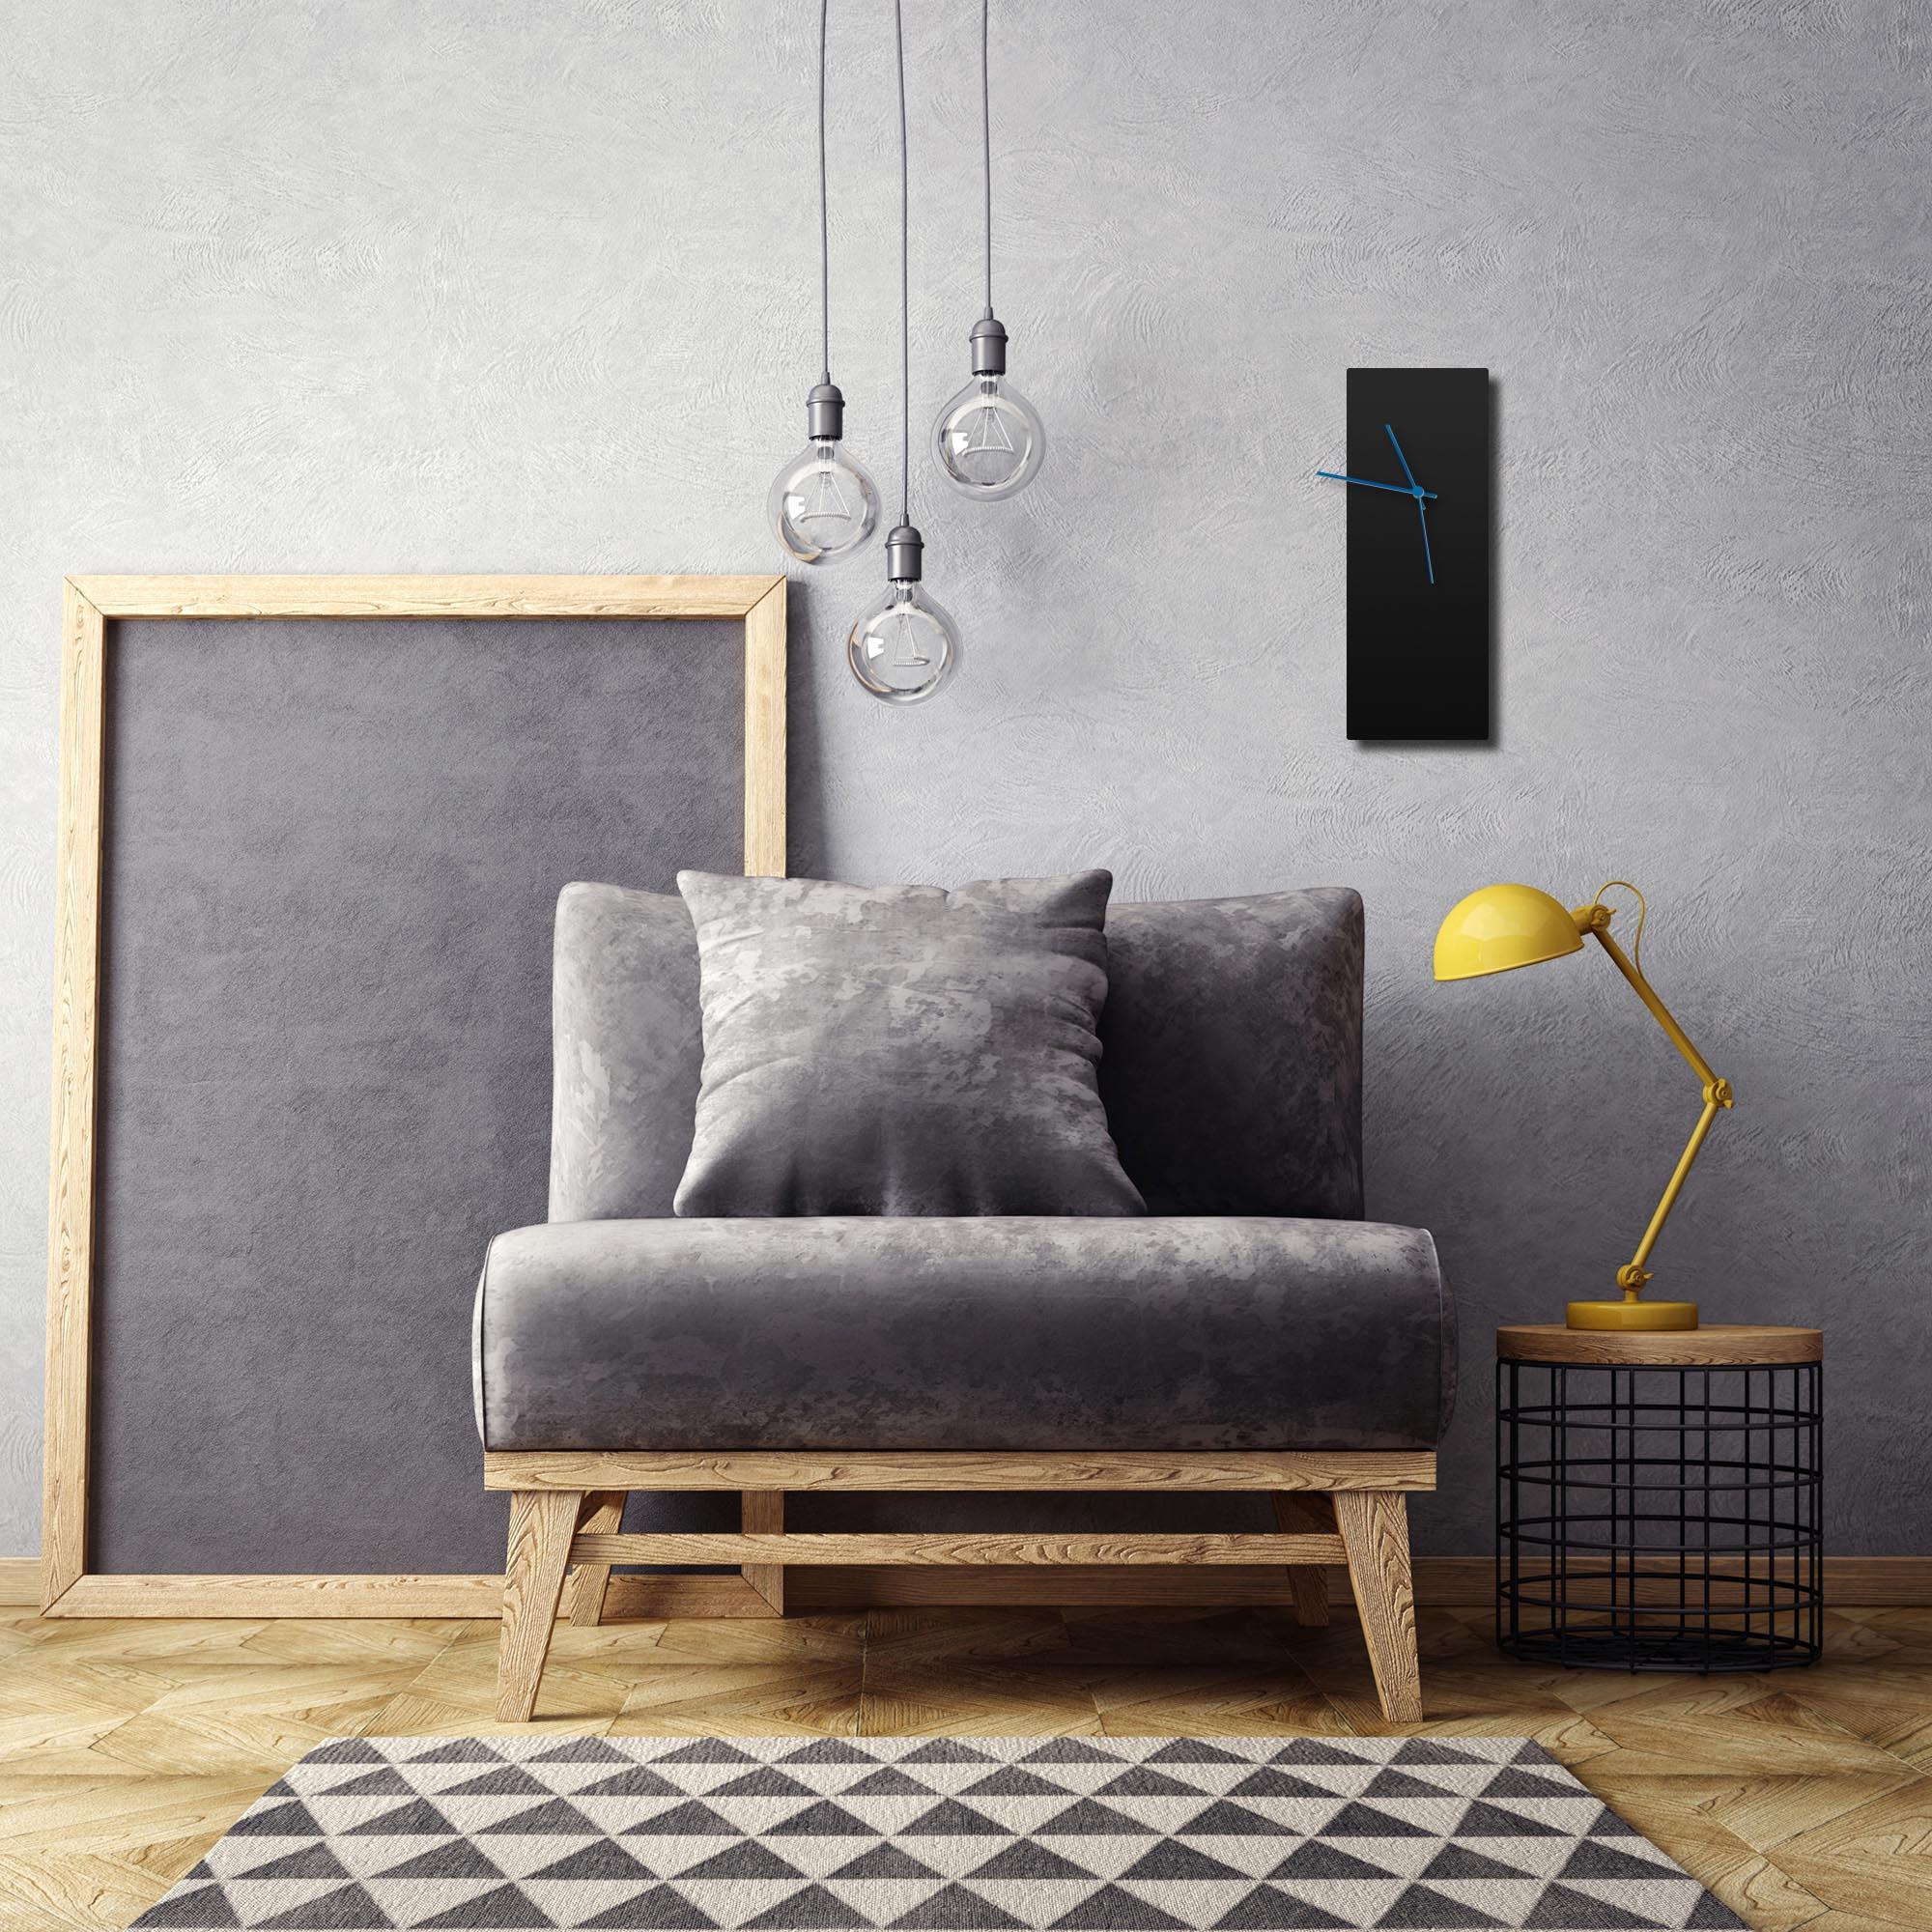 Blackout Blue Clock by Adam Schwoeppe Contemporary Clock on Aluminum Polymetal - Alternate View 1